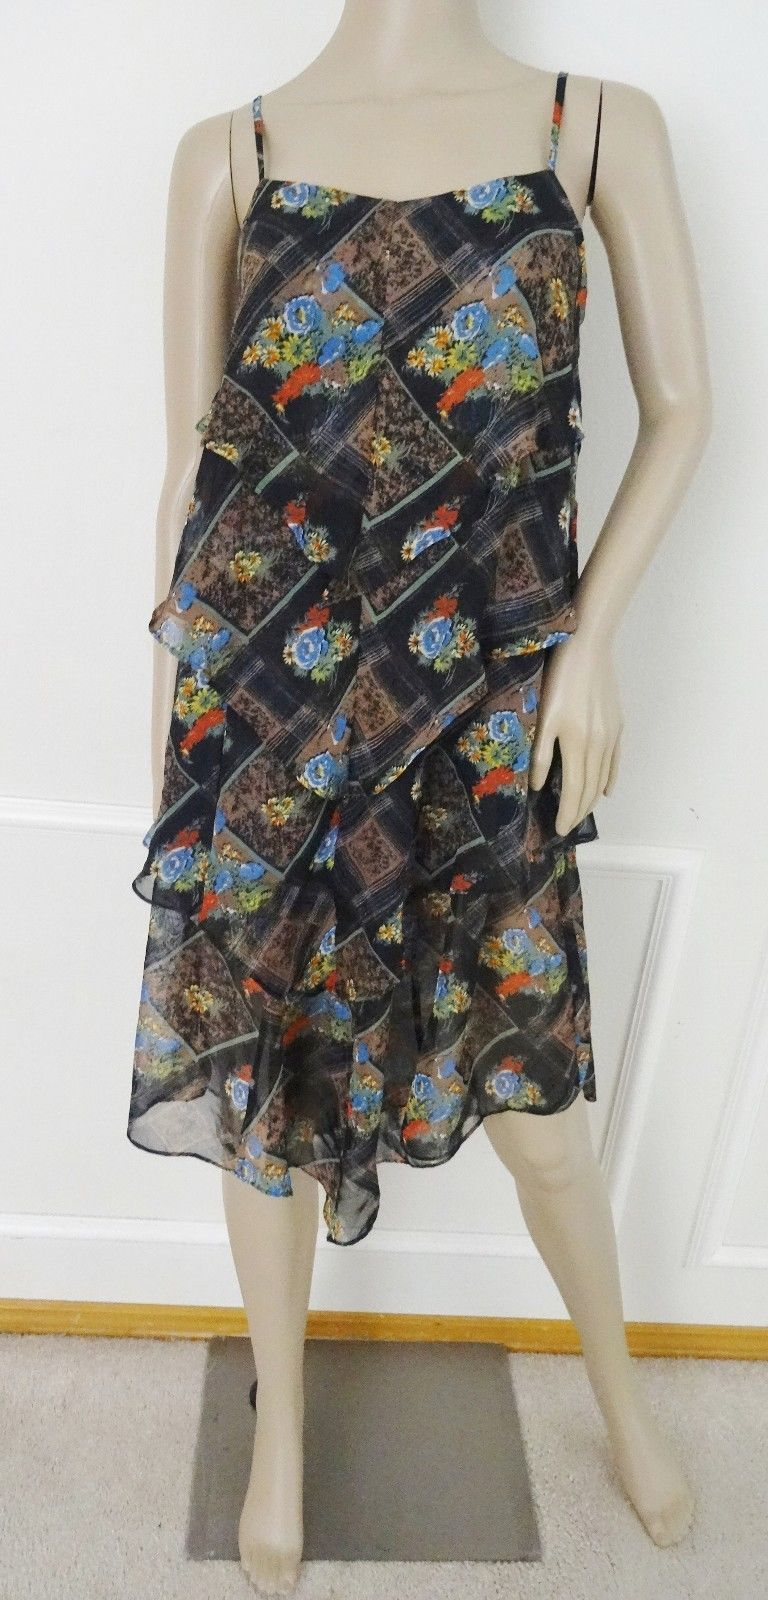 New $128 Free People Star Slip Dress Crochet Midi Size XS IVORY